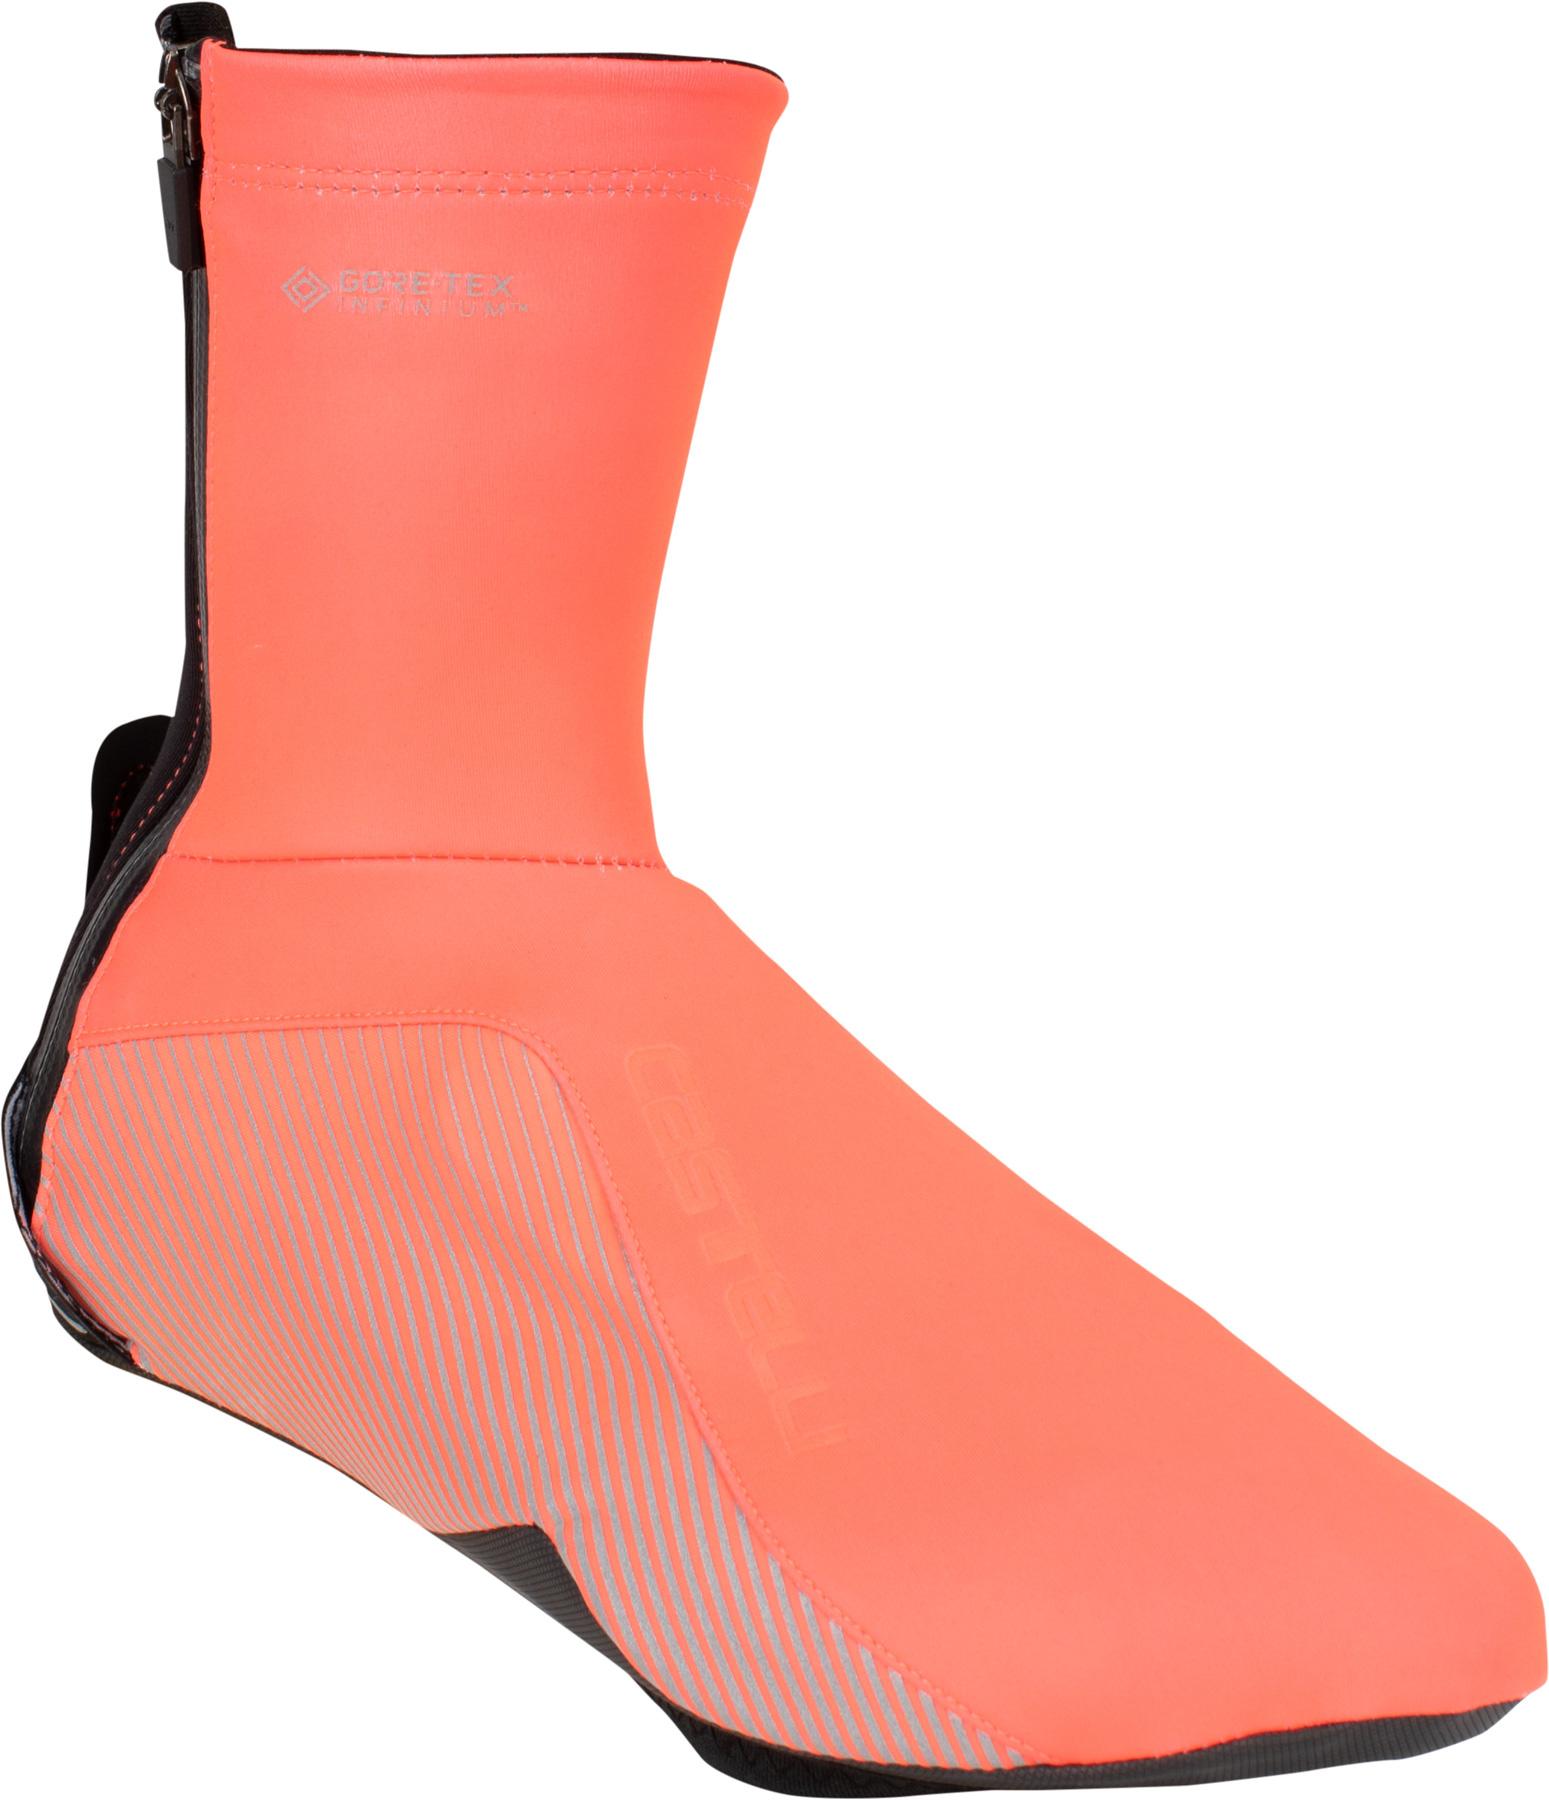 Castelli Dinamica W Shoecover Women's - brilliant pink 288